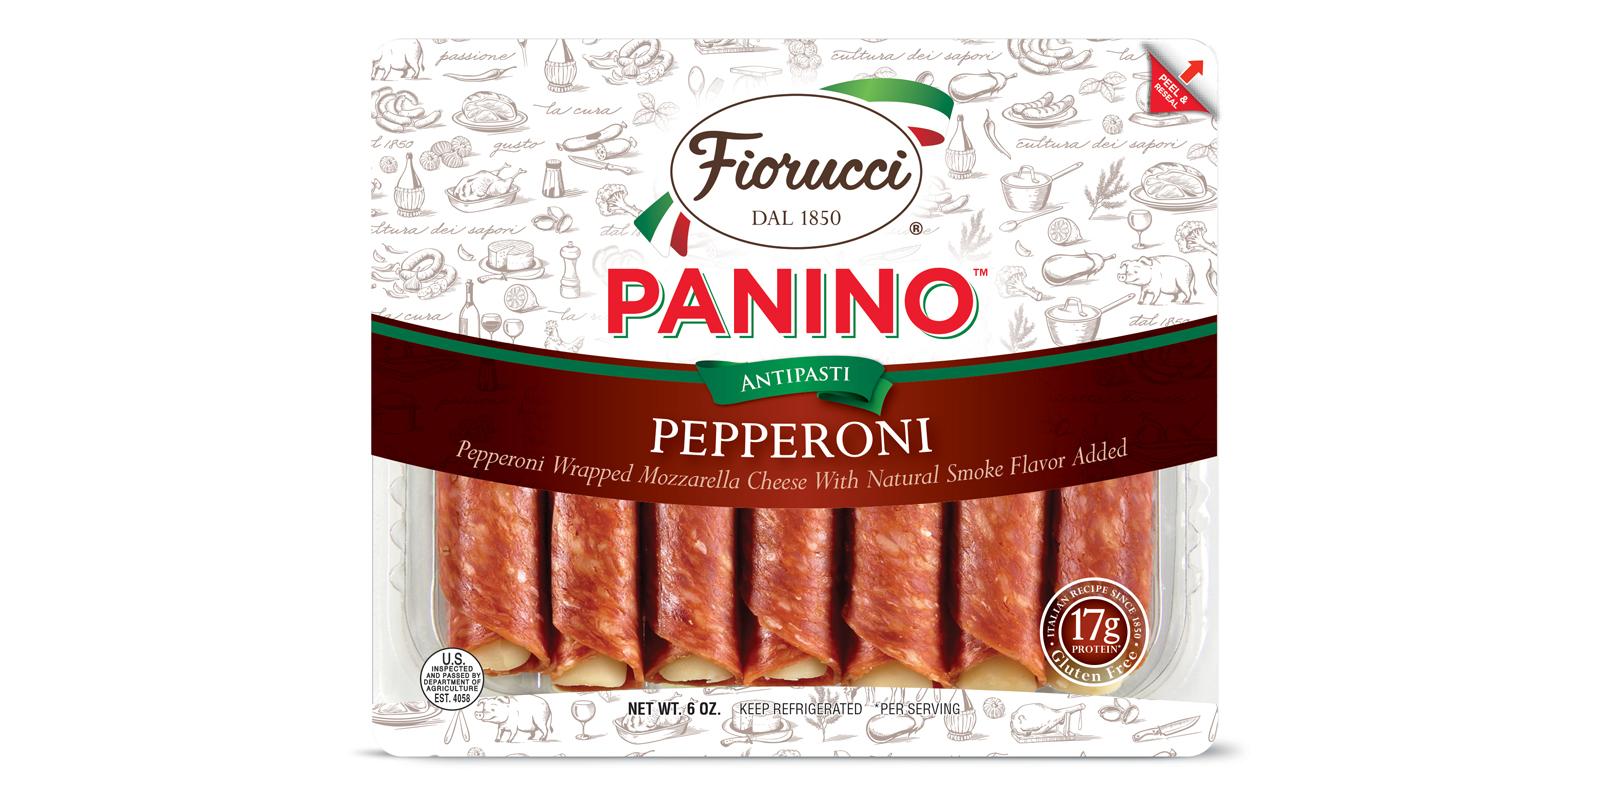 fiorucci-panino.jpg